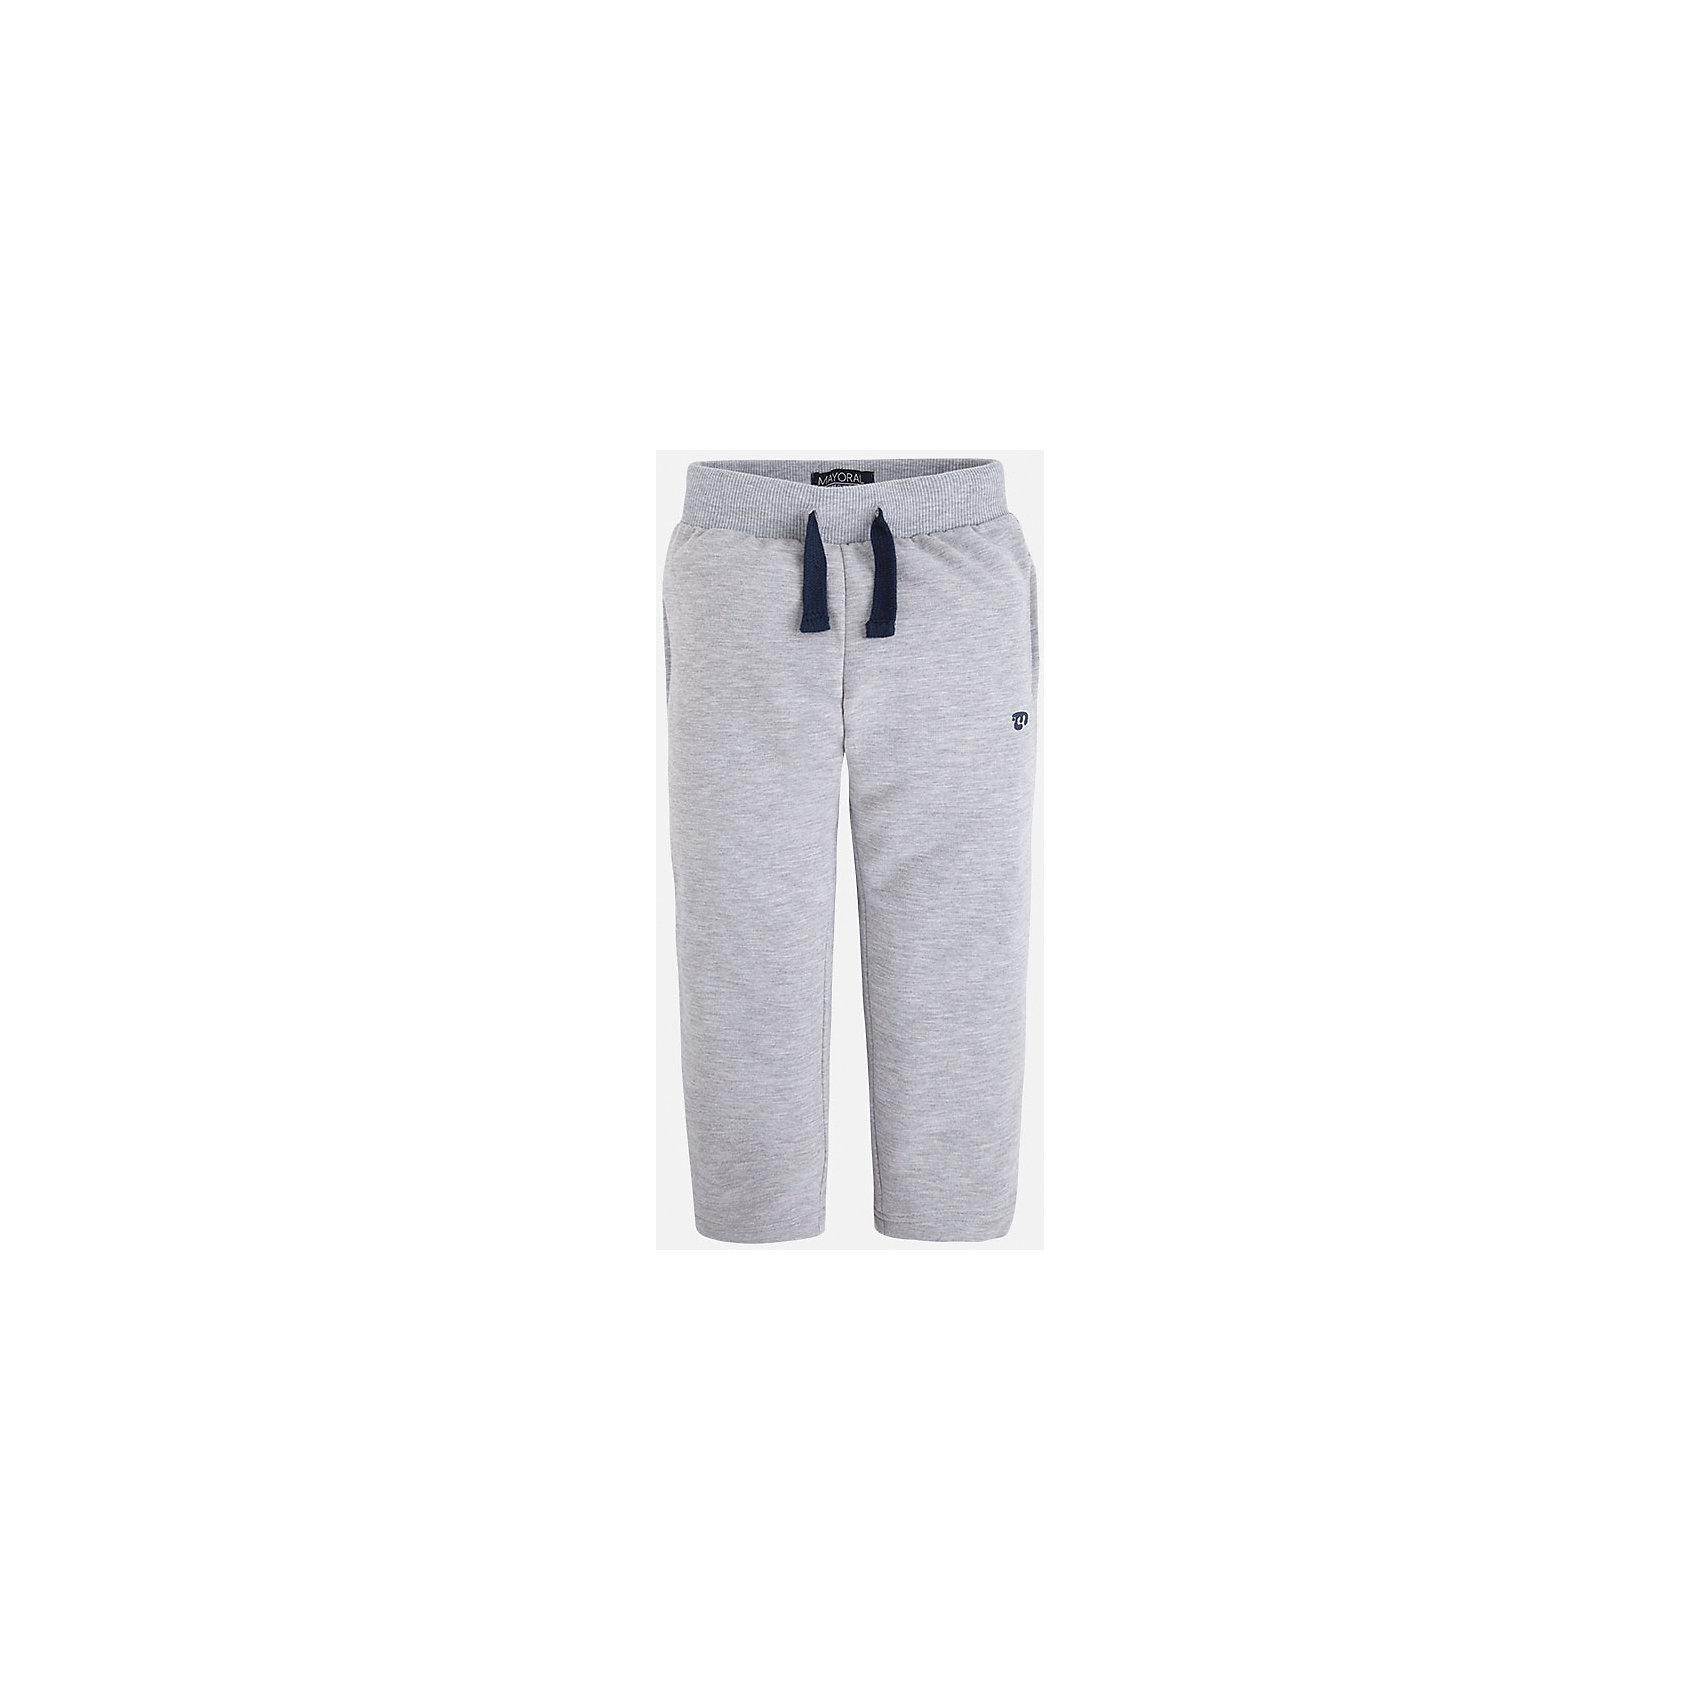 Mayoral Брюки для мальчика Mayoral trybeyond брюки для мальчика 999 82496 00 45a серый trybeyond